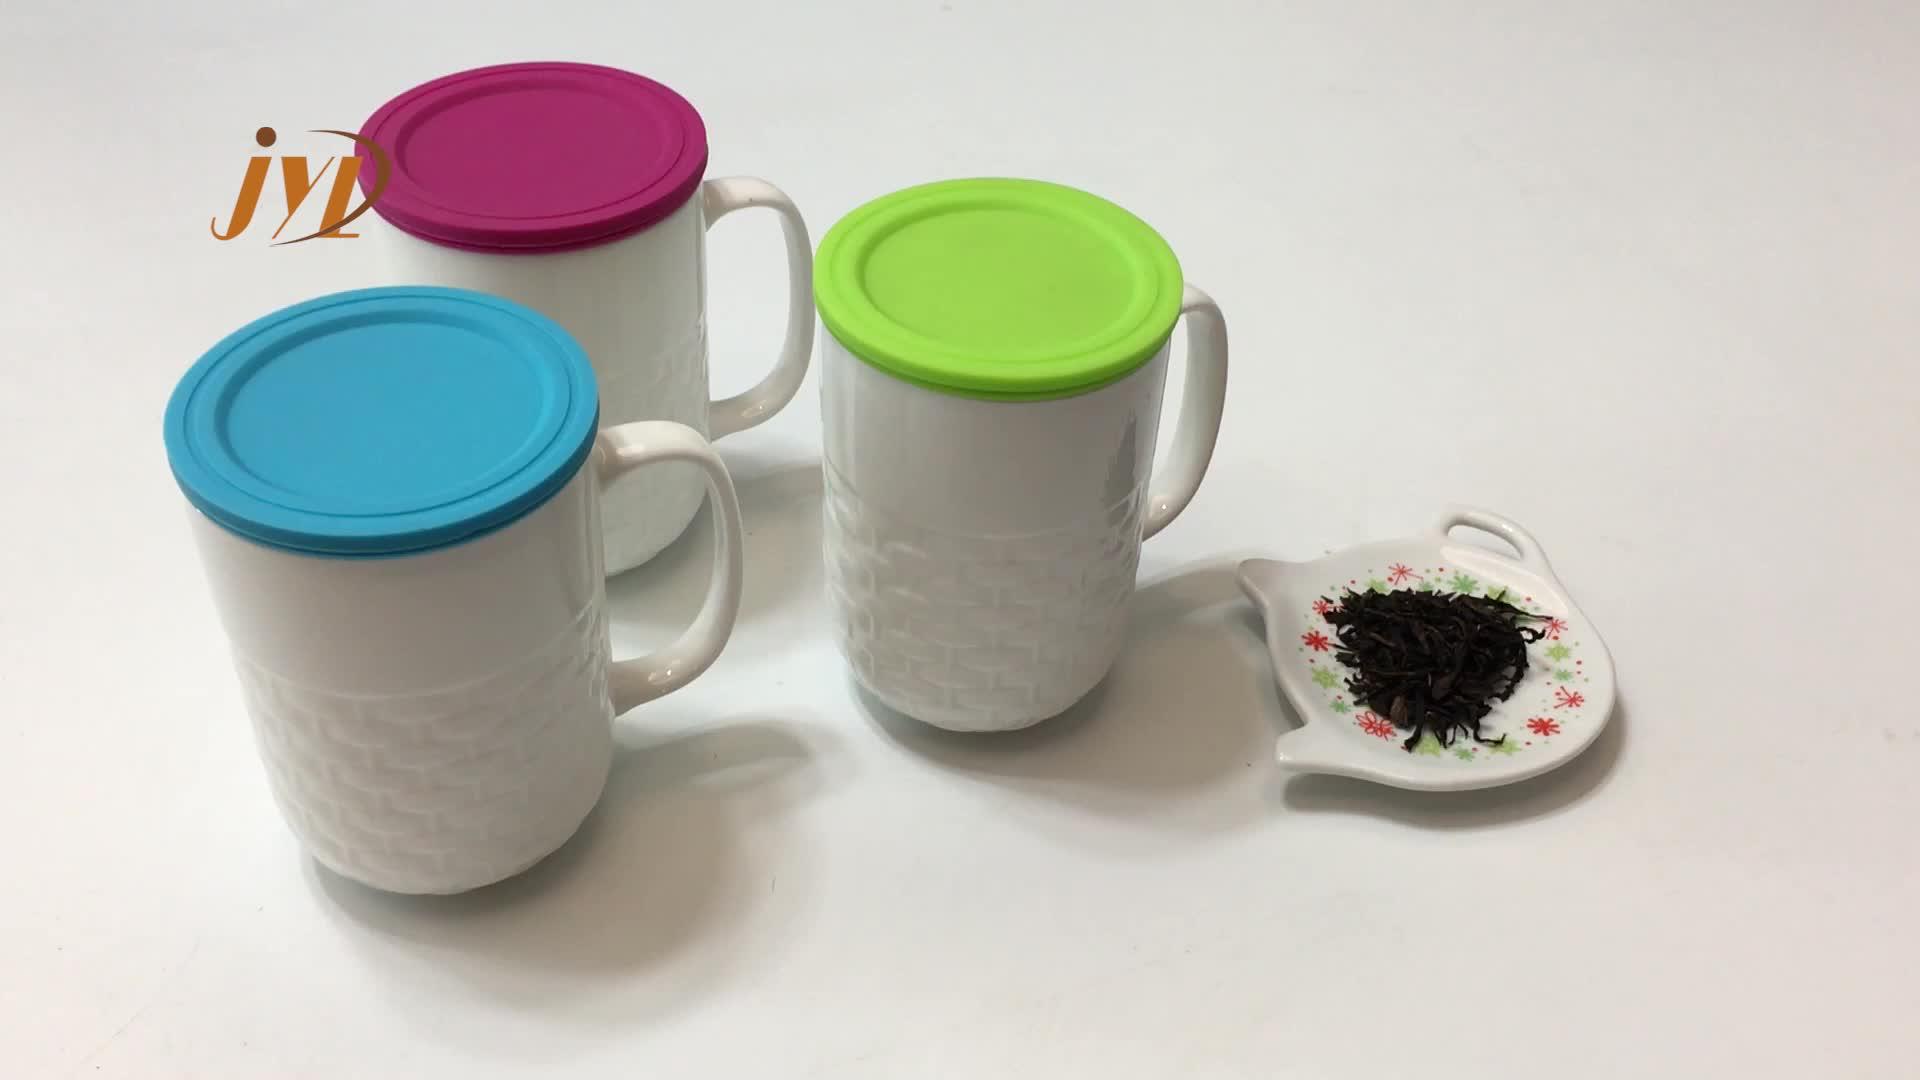 Drinkware type ceramic tea 2019 rea mug with strainer